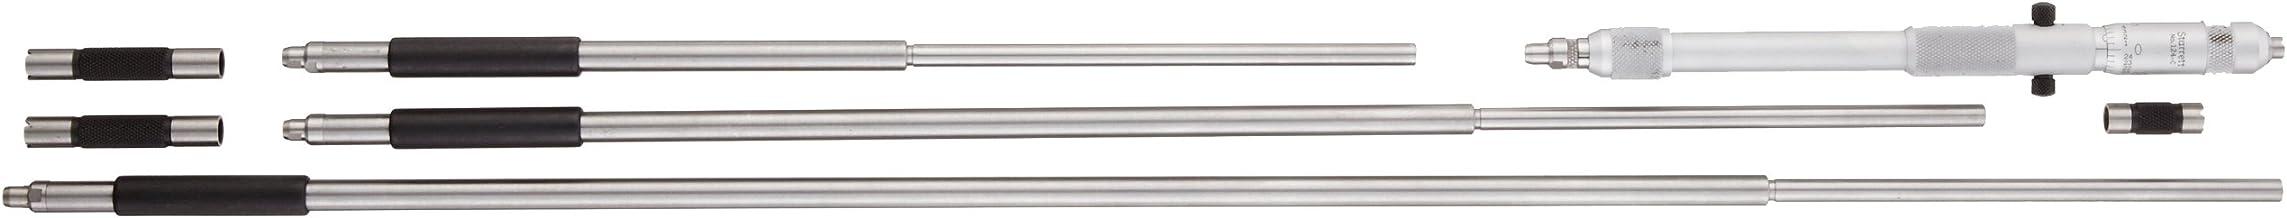 Starrett 824E Fixed Range Vernier Inside Micrometer 0.001 Graduation +//-0.0001 Accuracy 7-8 Range